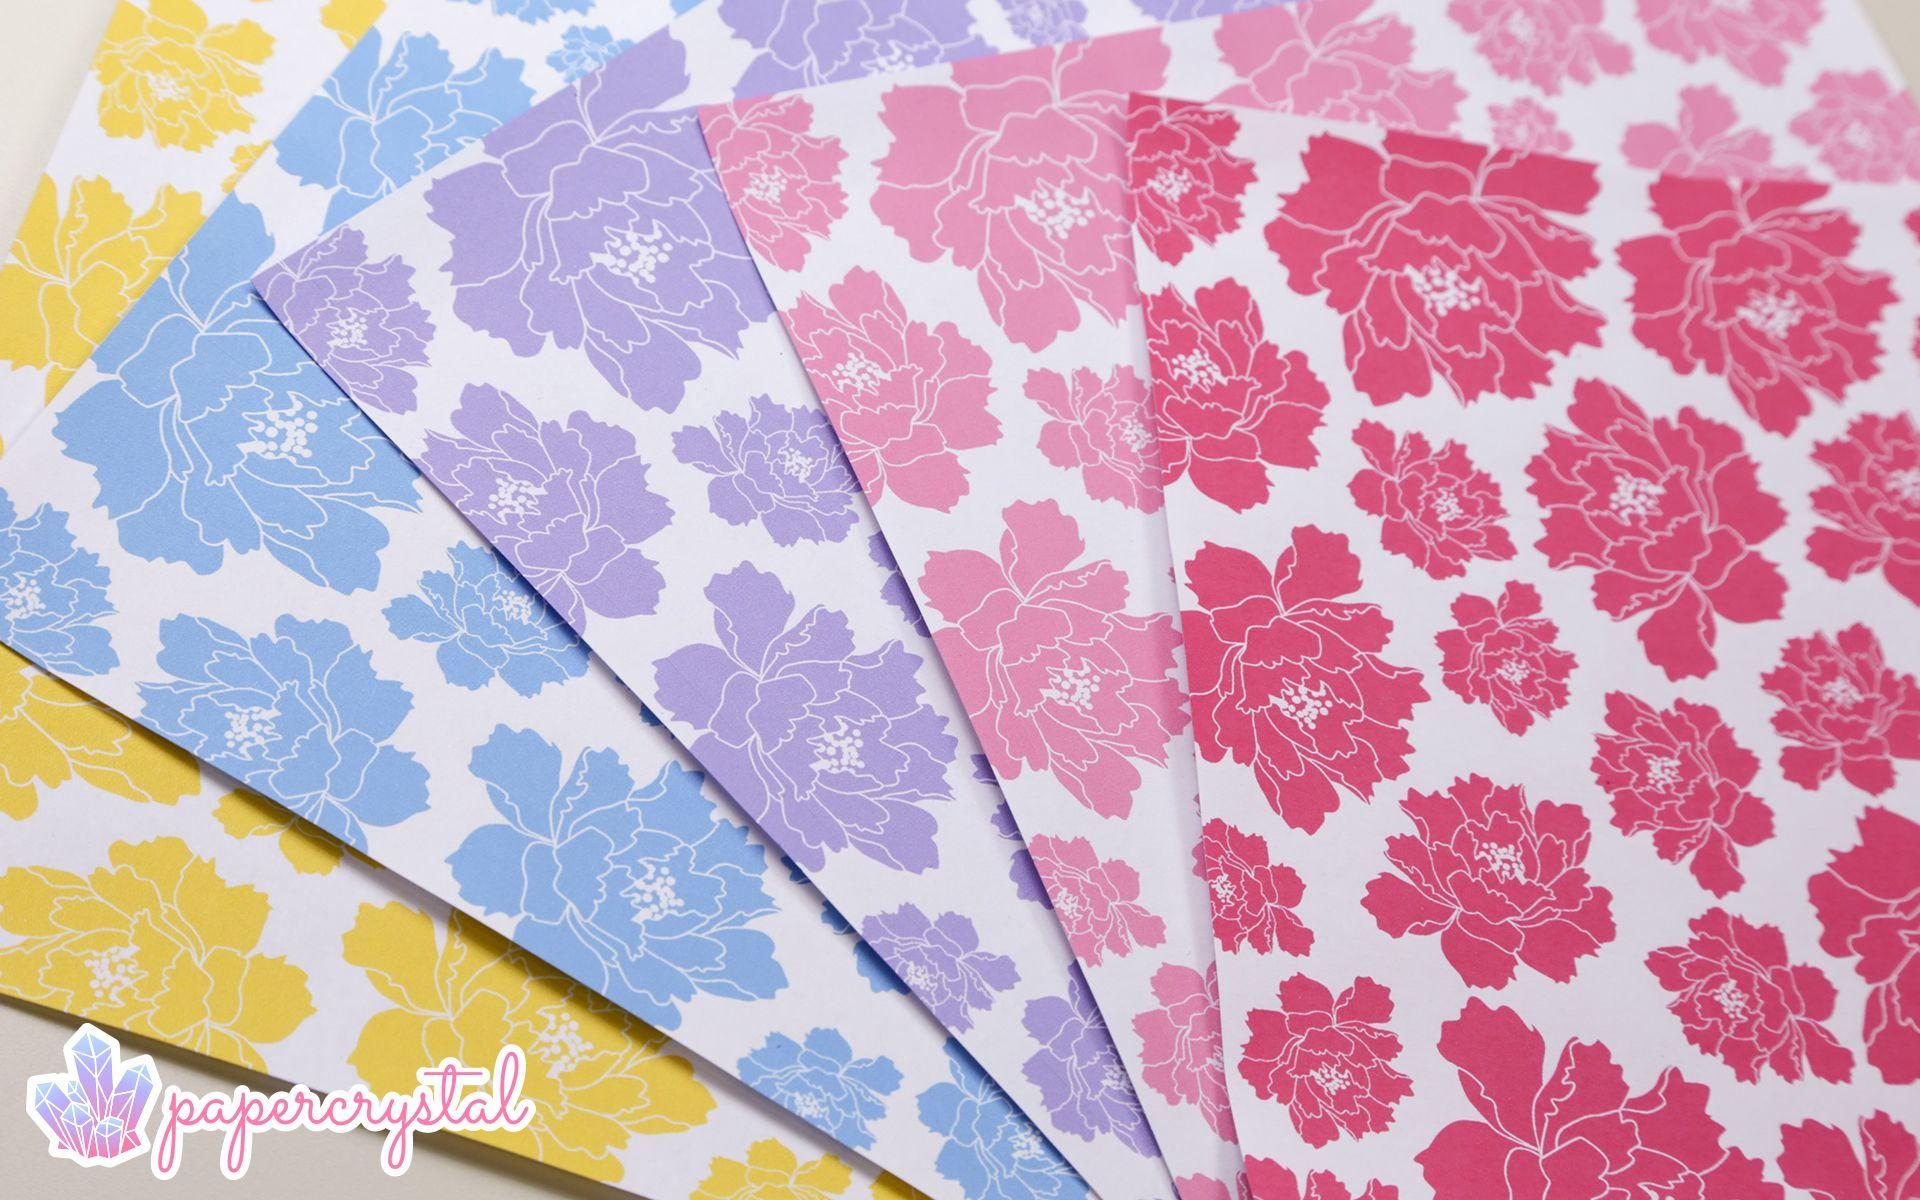 Printable Origami Paper | LoveToKnow | 1200x1920